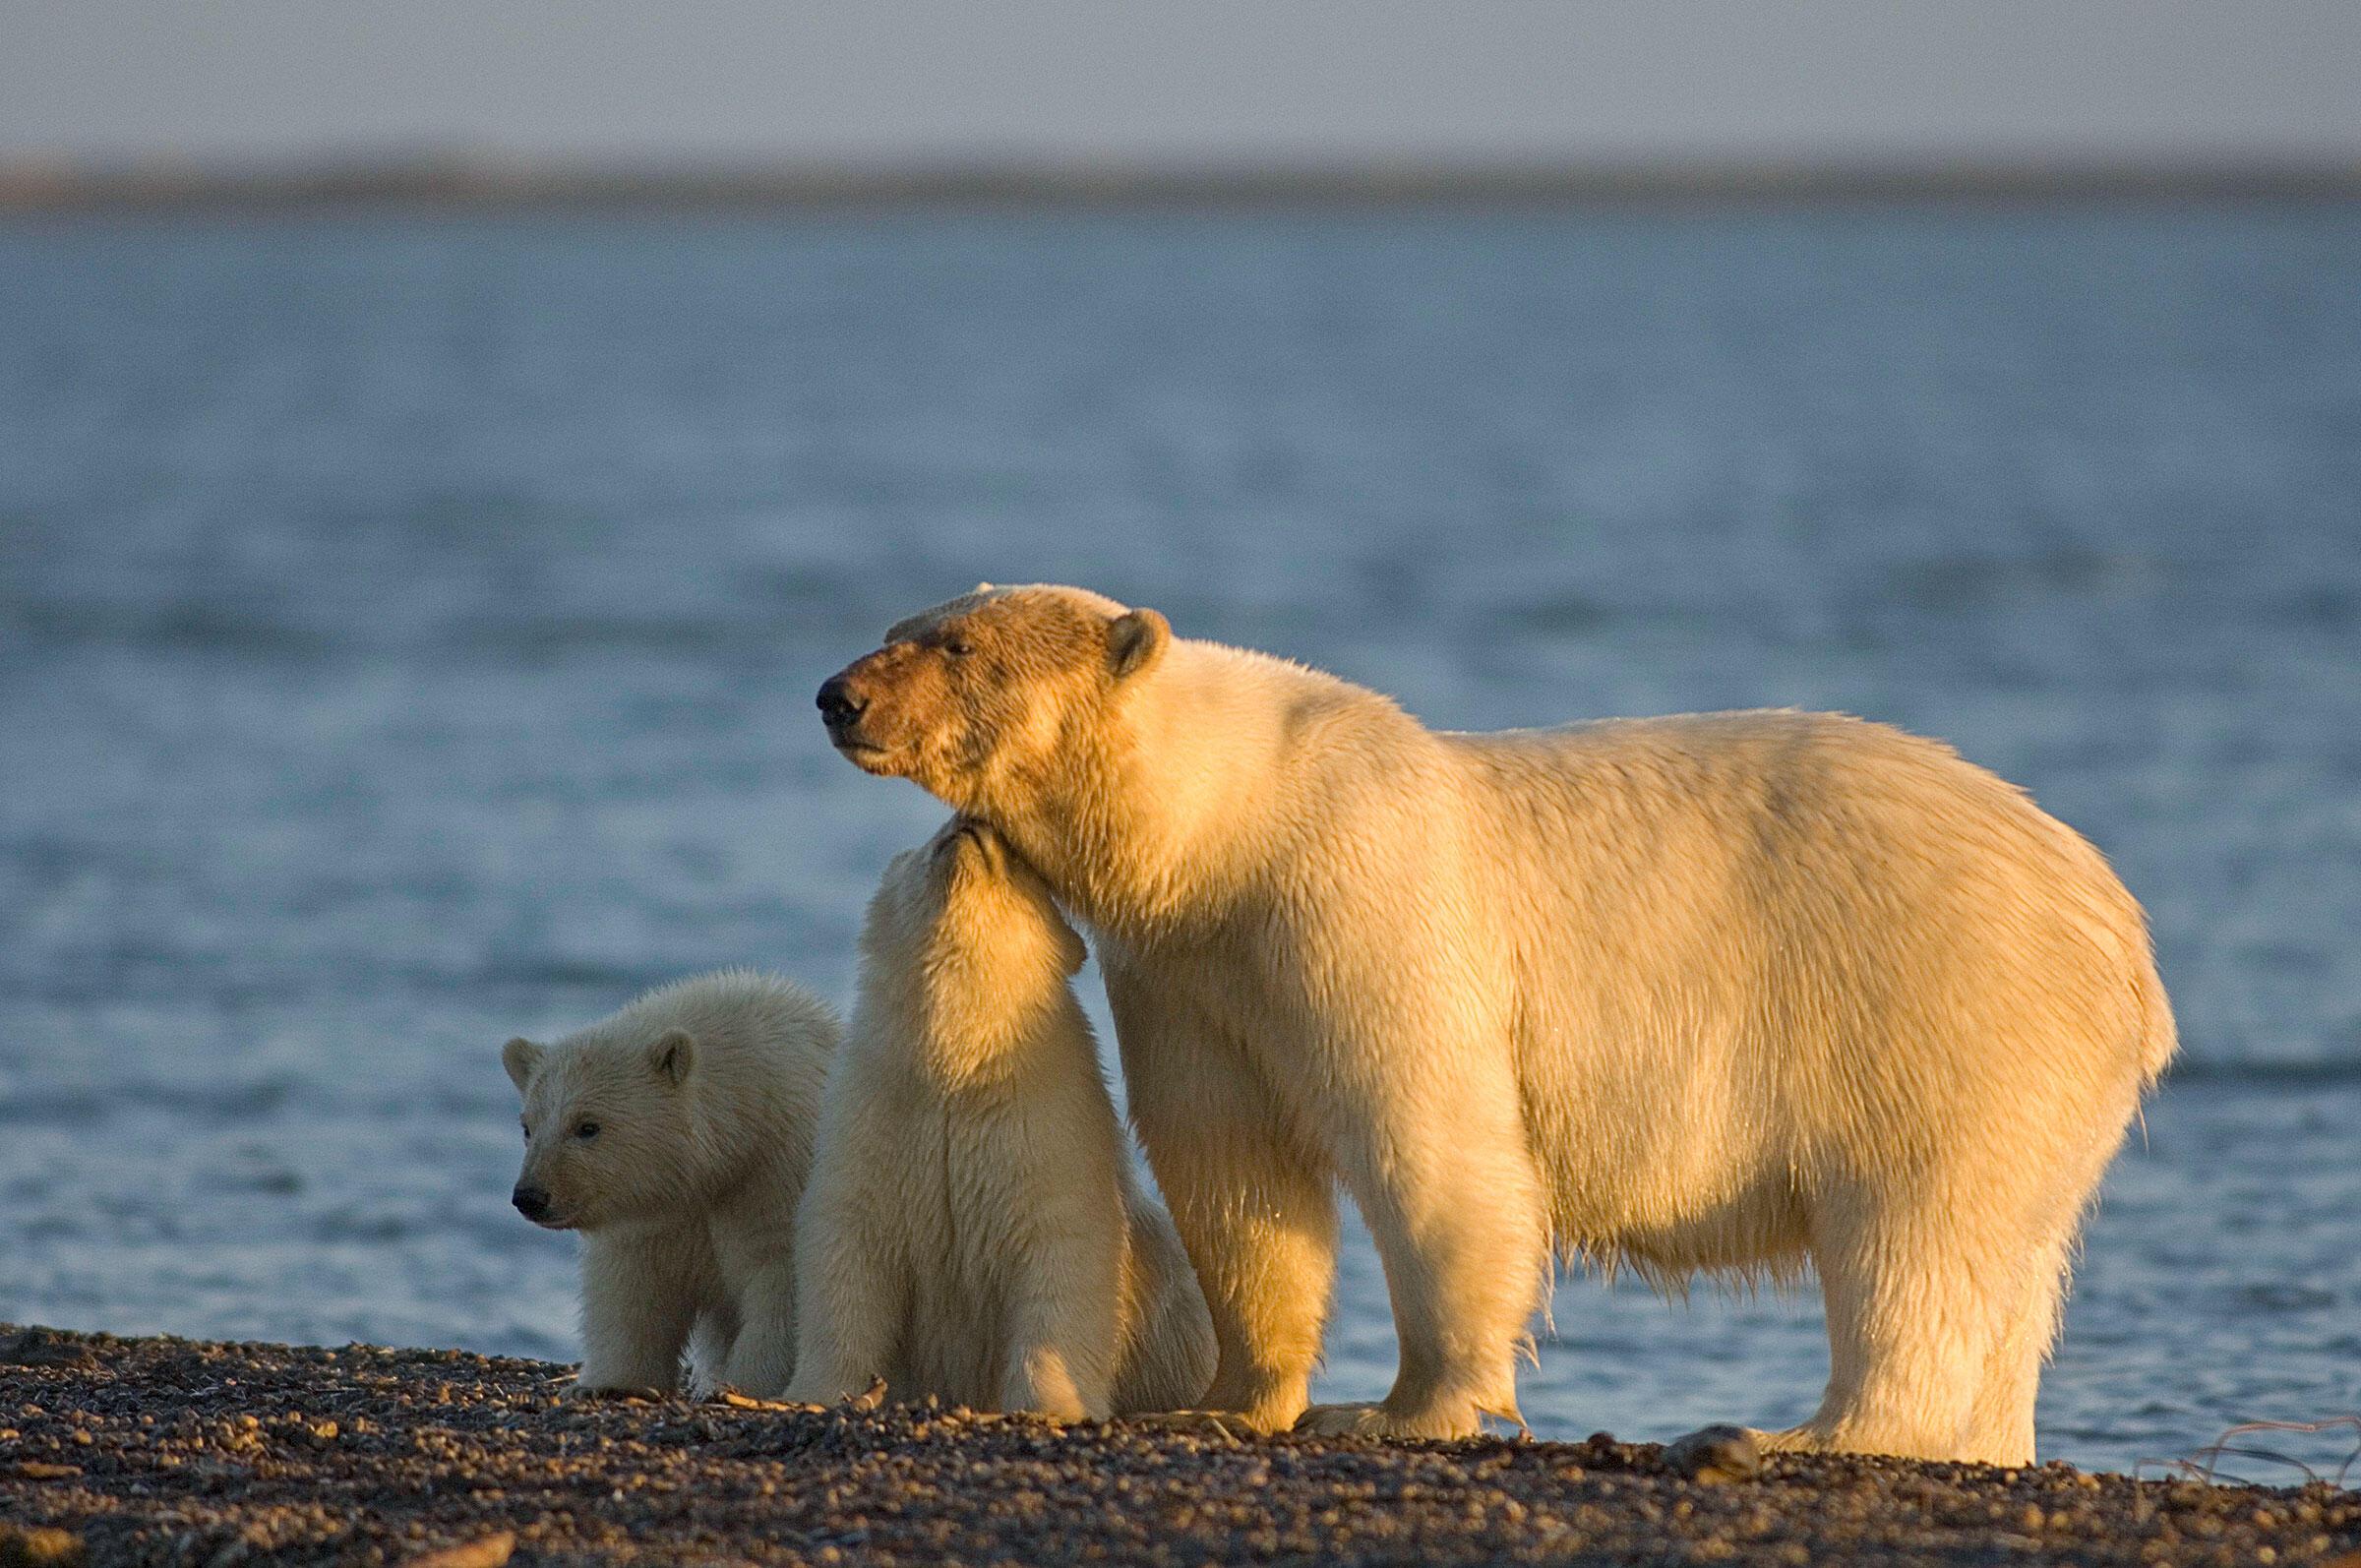 Energy development in the Arctic Refuge will likely harm polar bears and other wildlife. Steven J. Kazlowski/Alamy